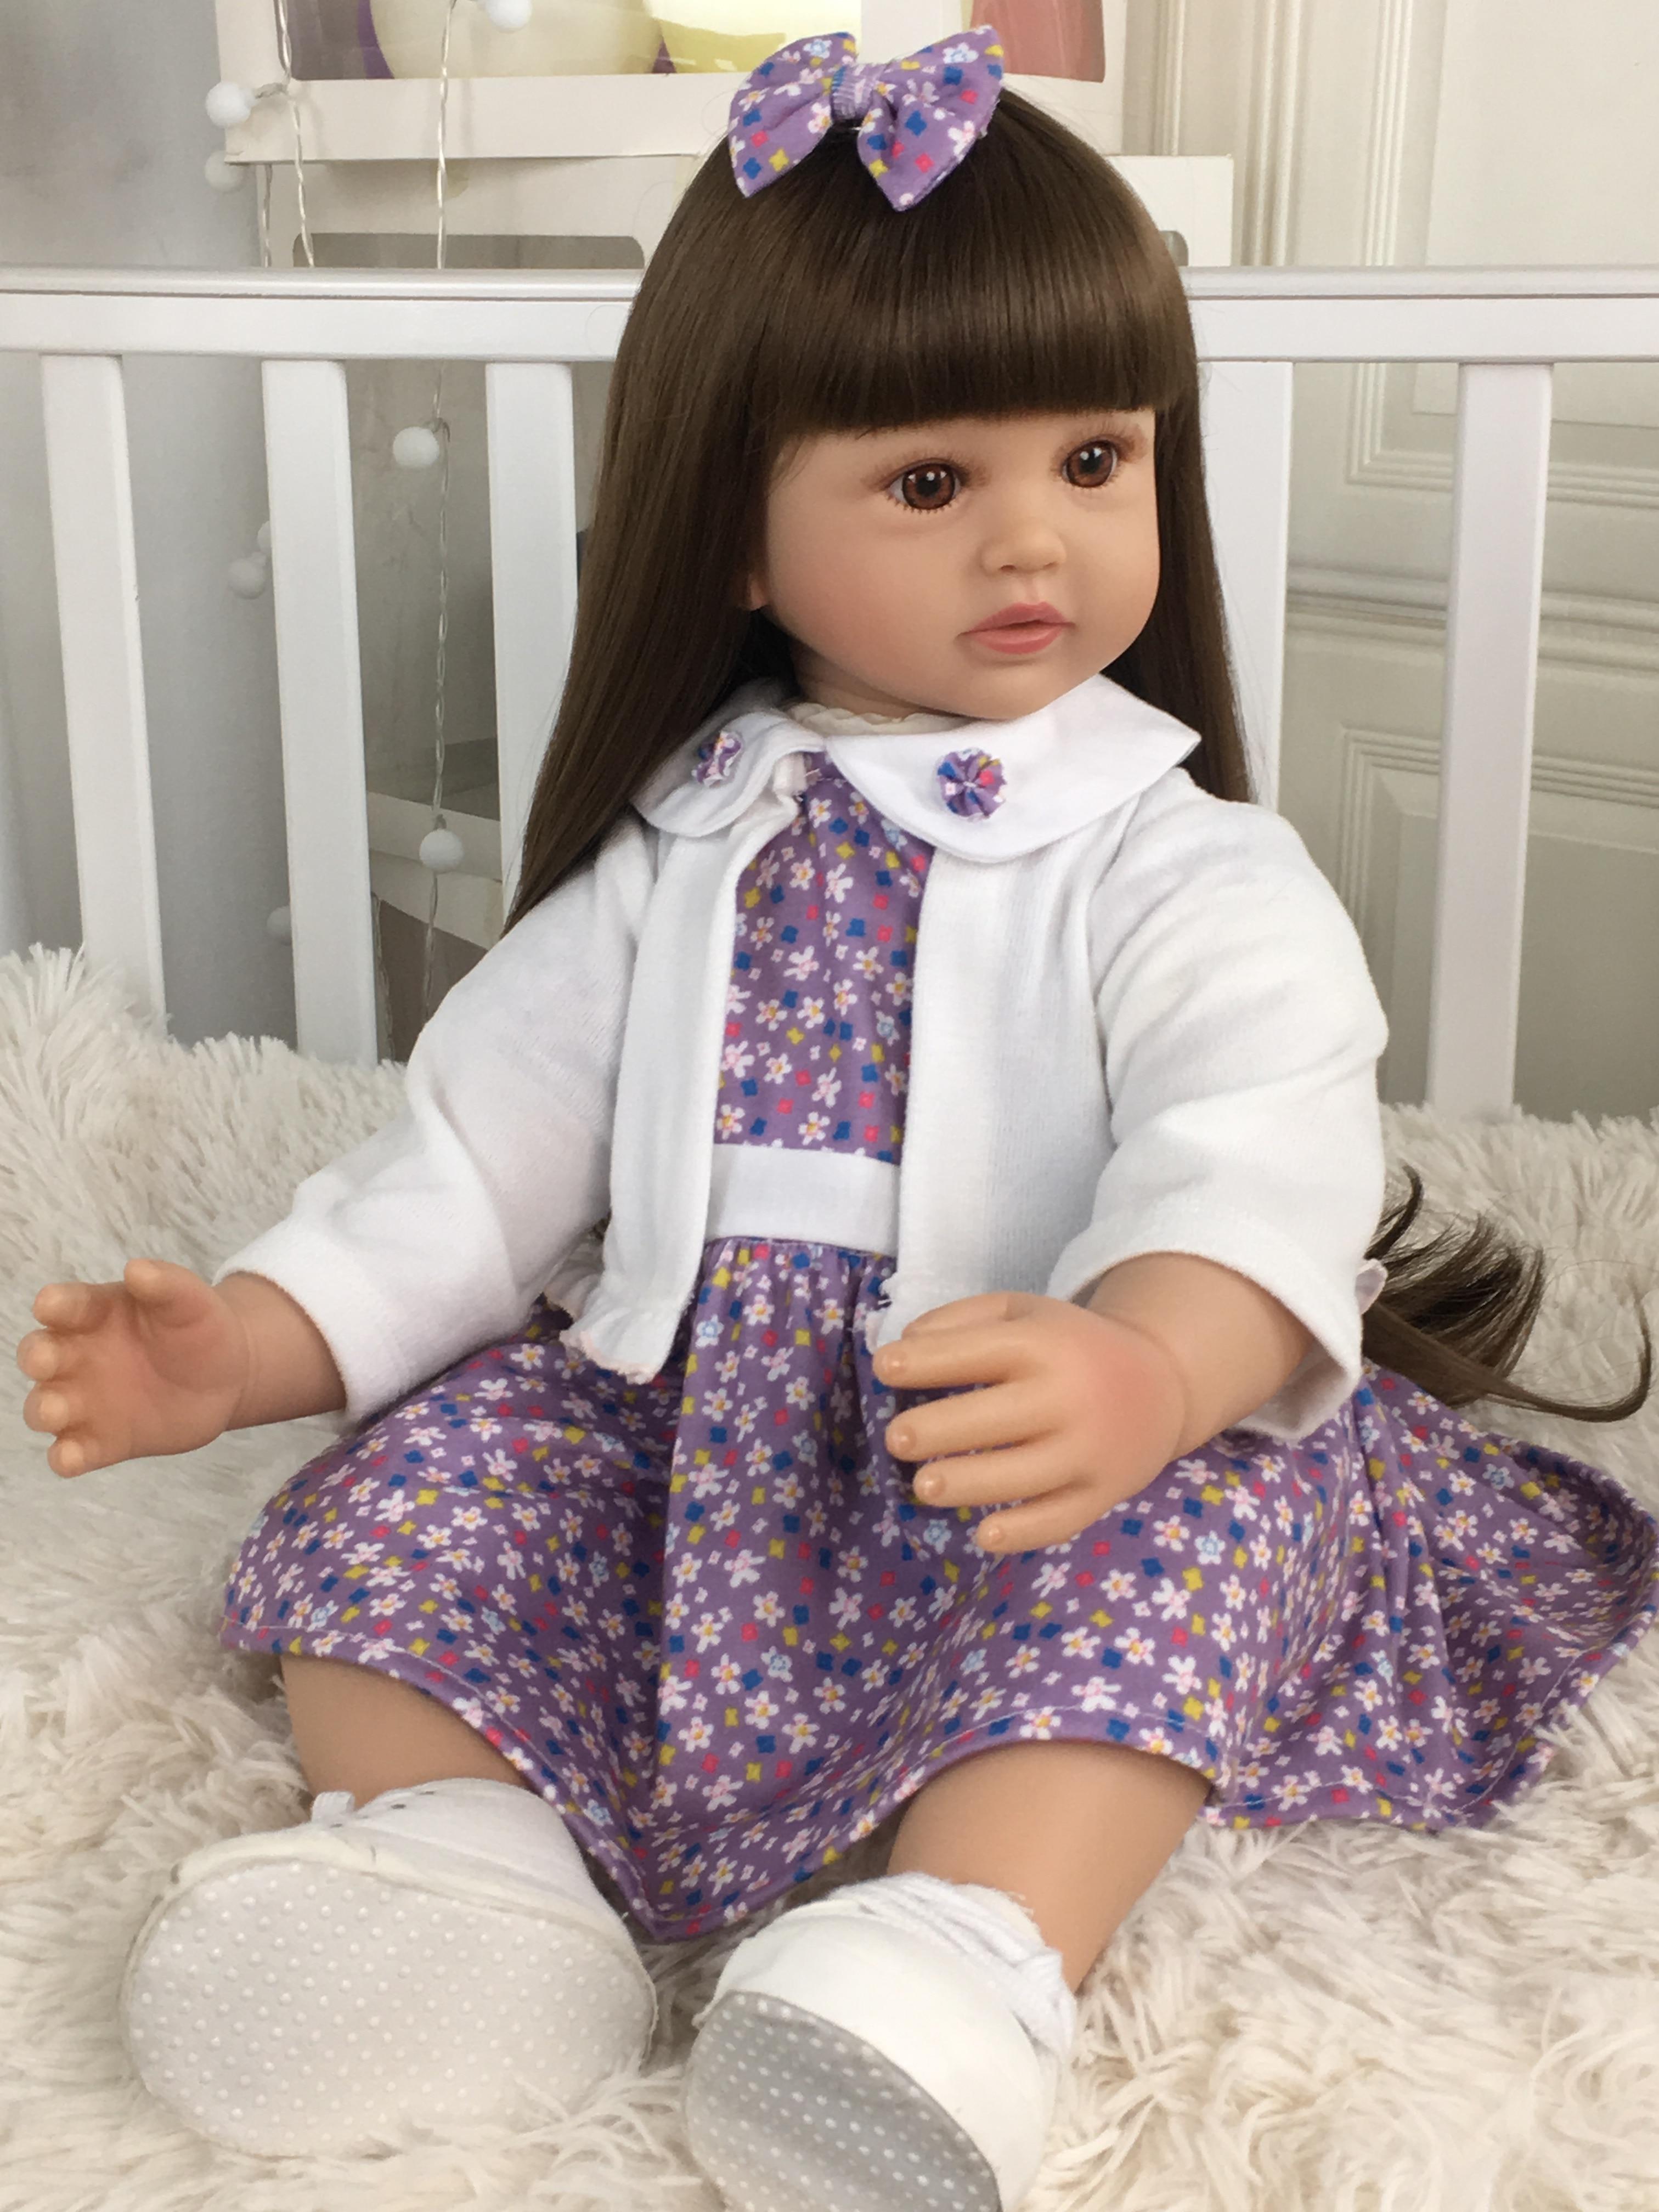 кукла-младенец keiumi 24d176-c584-s07-t52